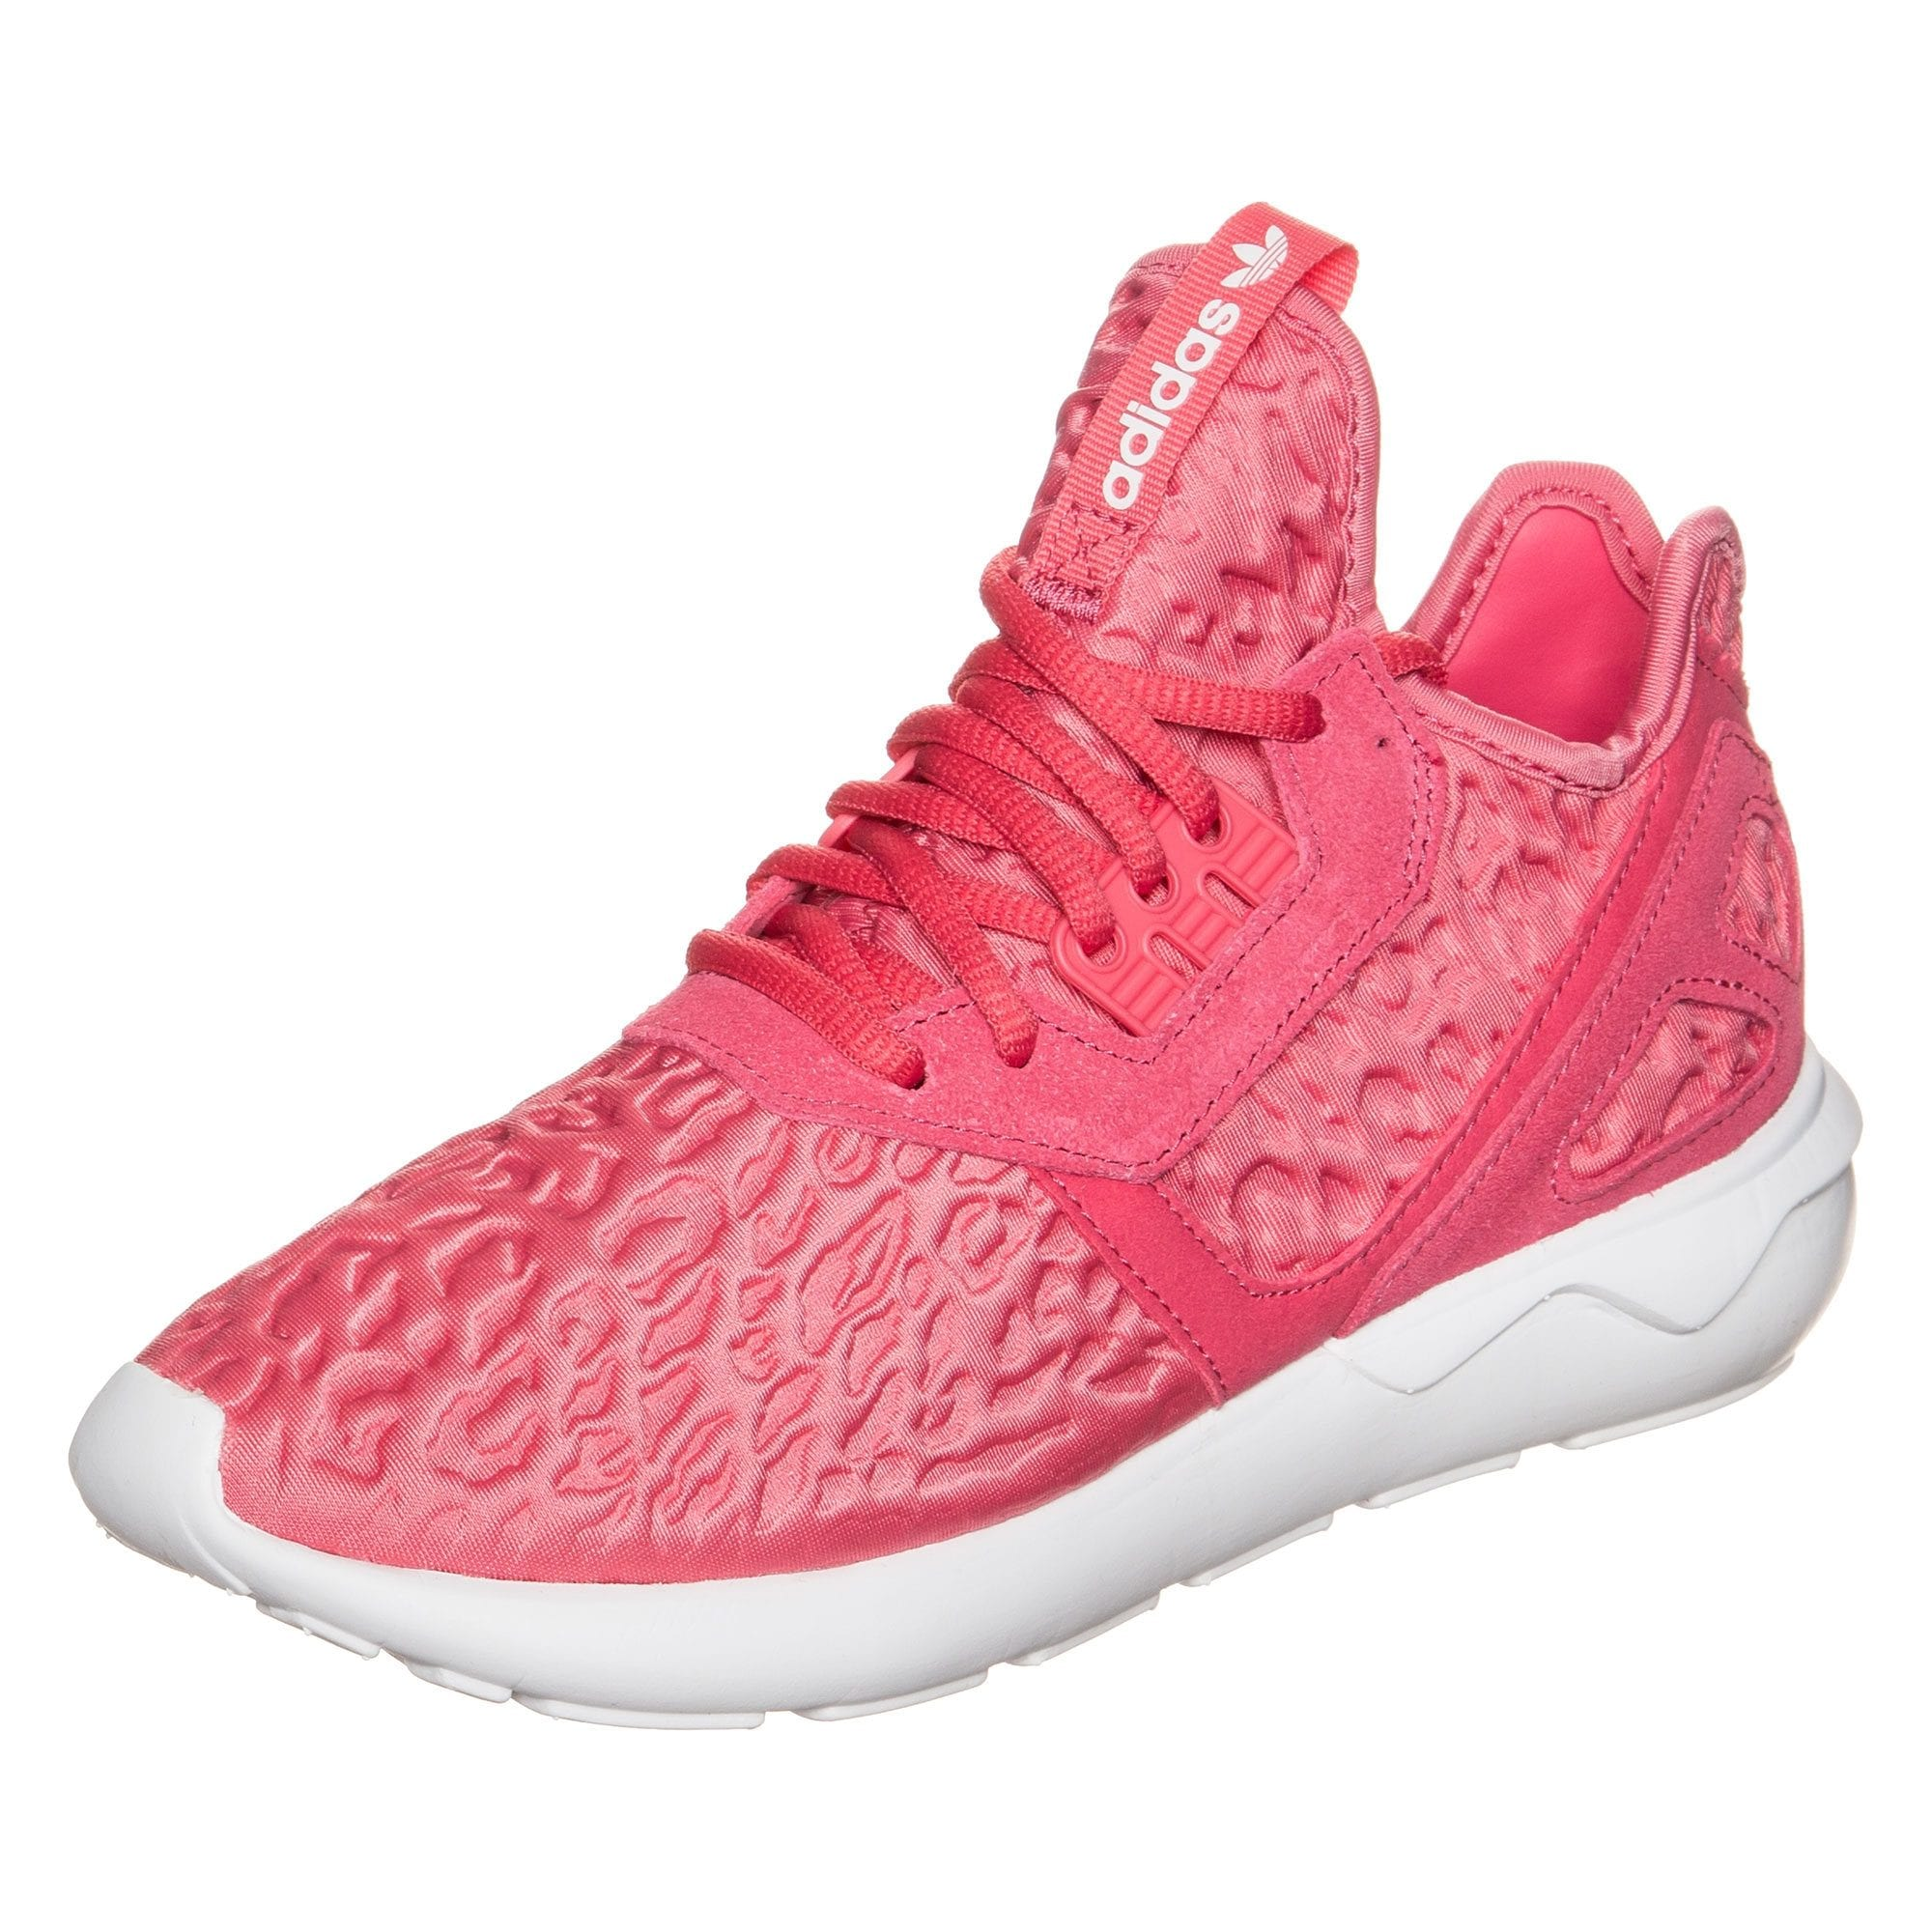 adidas Originals Tubular Runner Sneaker Damen Preisvergleich